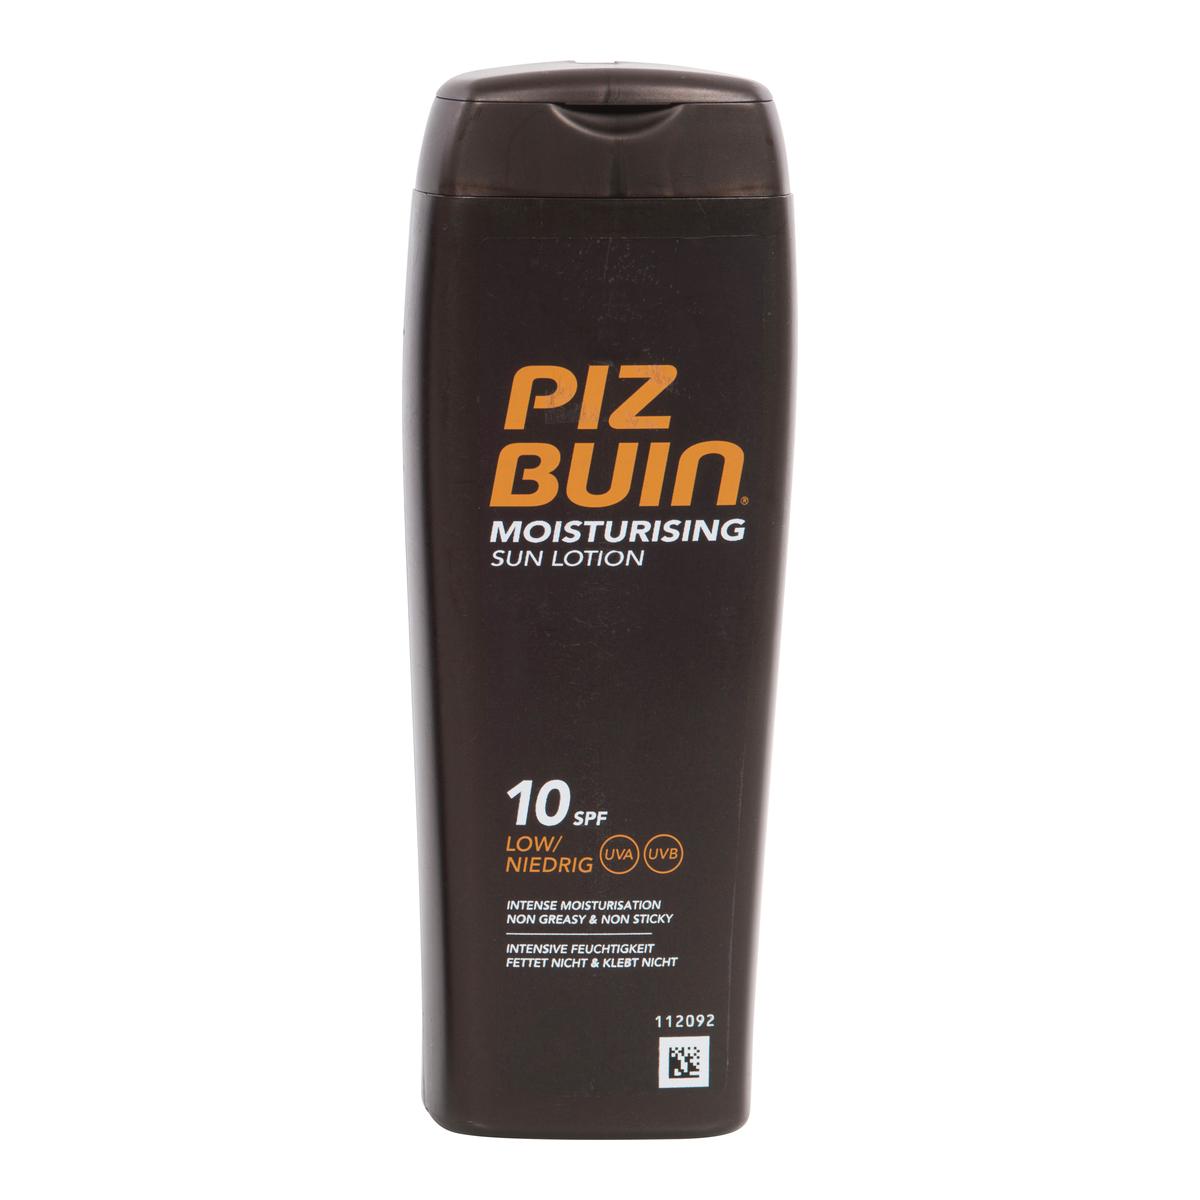 Sun lotion SF10-PIZ008